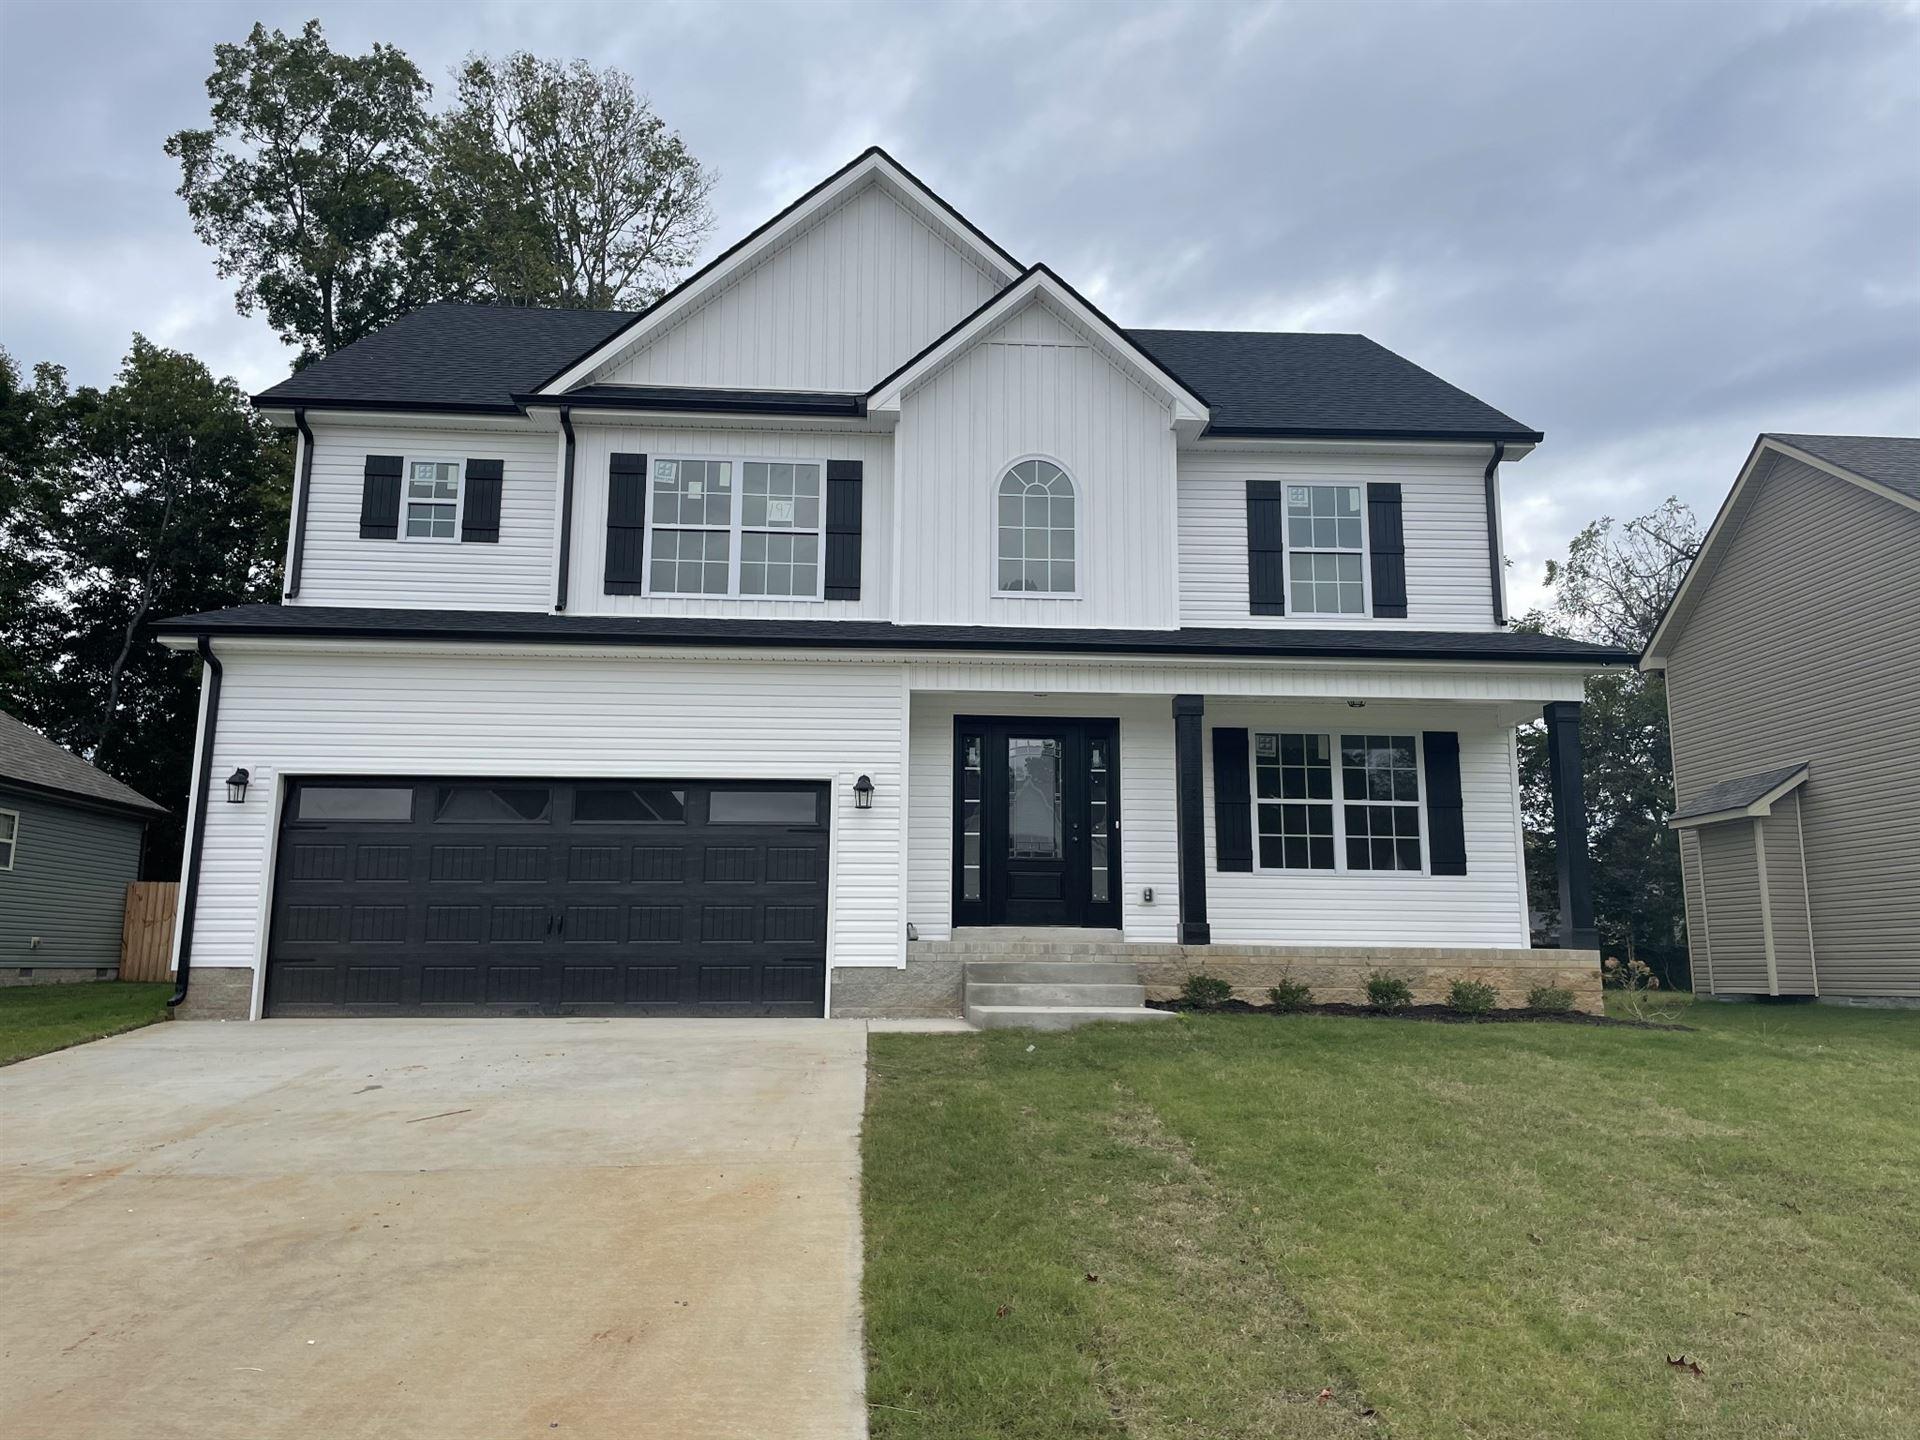 197 Hidden Springs, Clarksville, TN 37042 - MLS#: 2293881